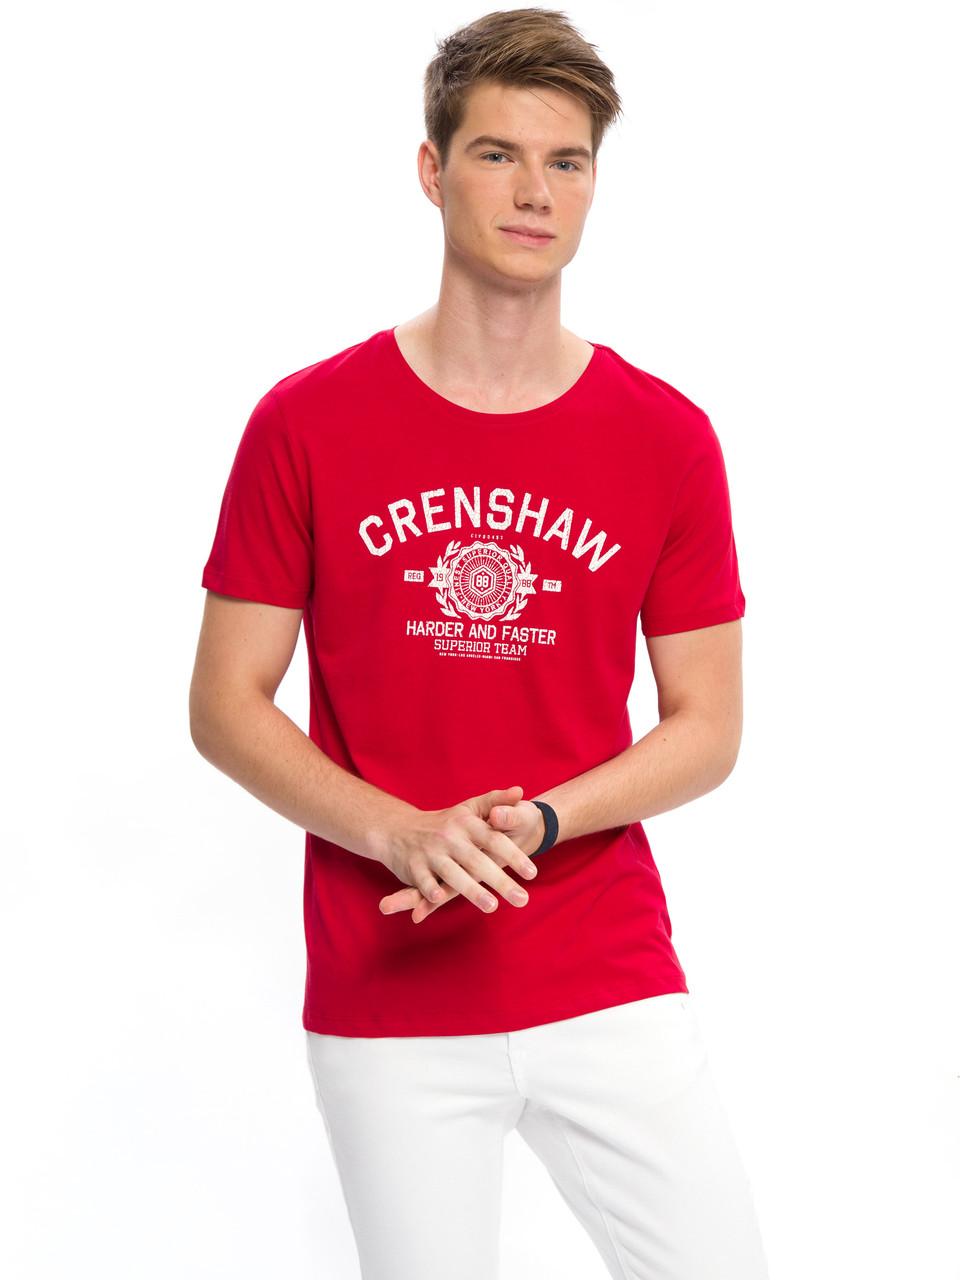 c22c34e71d5c1 Красная мужская футболка Lc Waikiki / Лс Вайкики с надписью Crenshaw ...